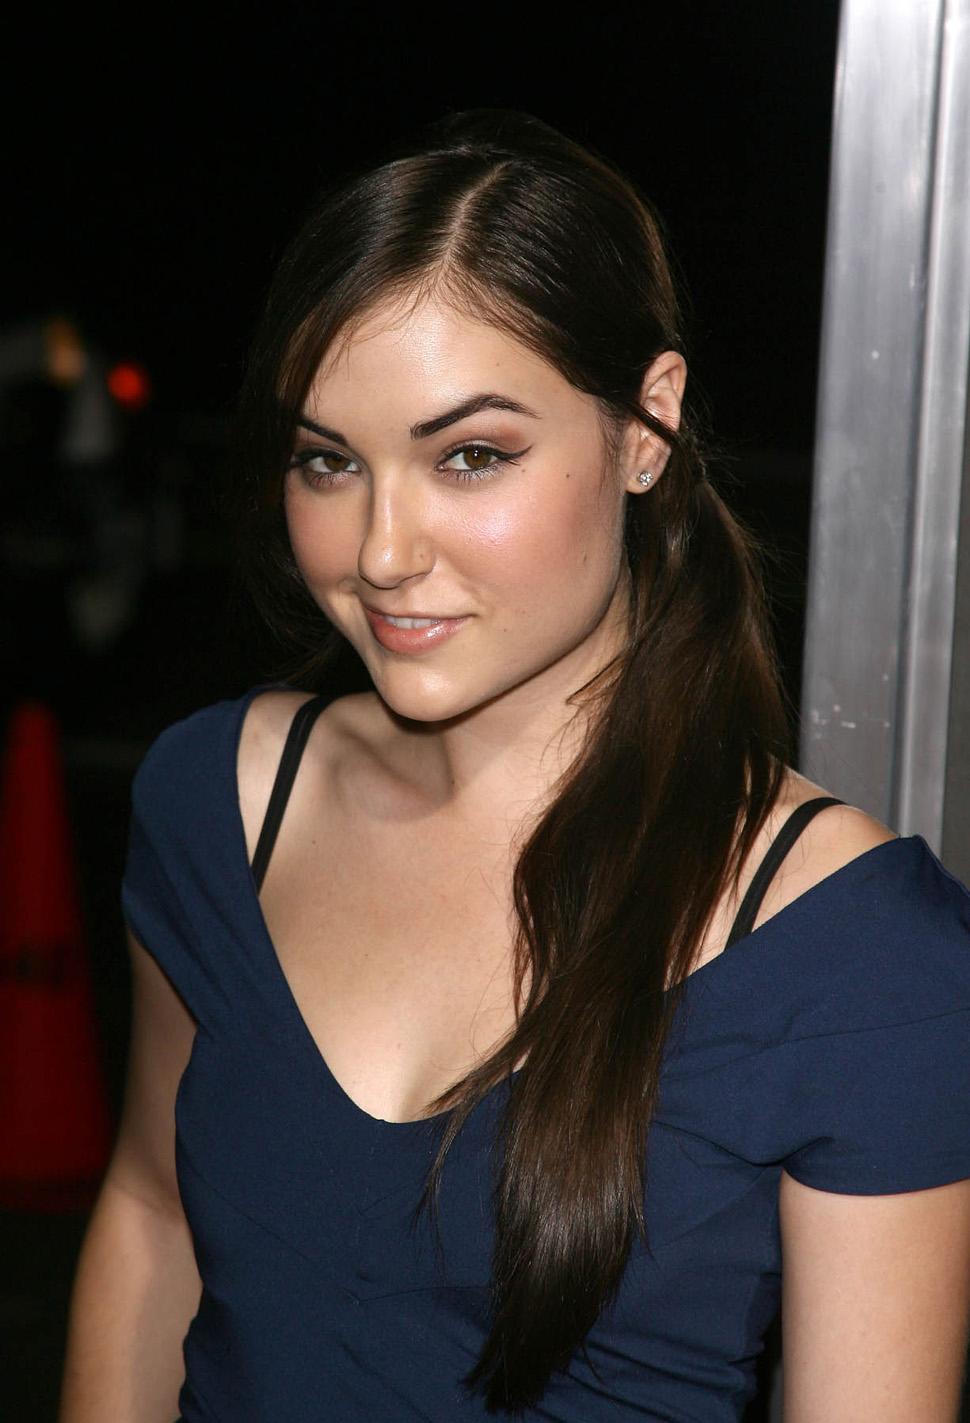 Sasha Gery Porn Star